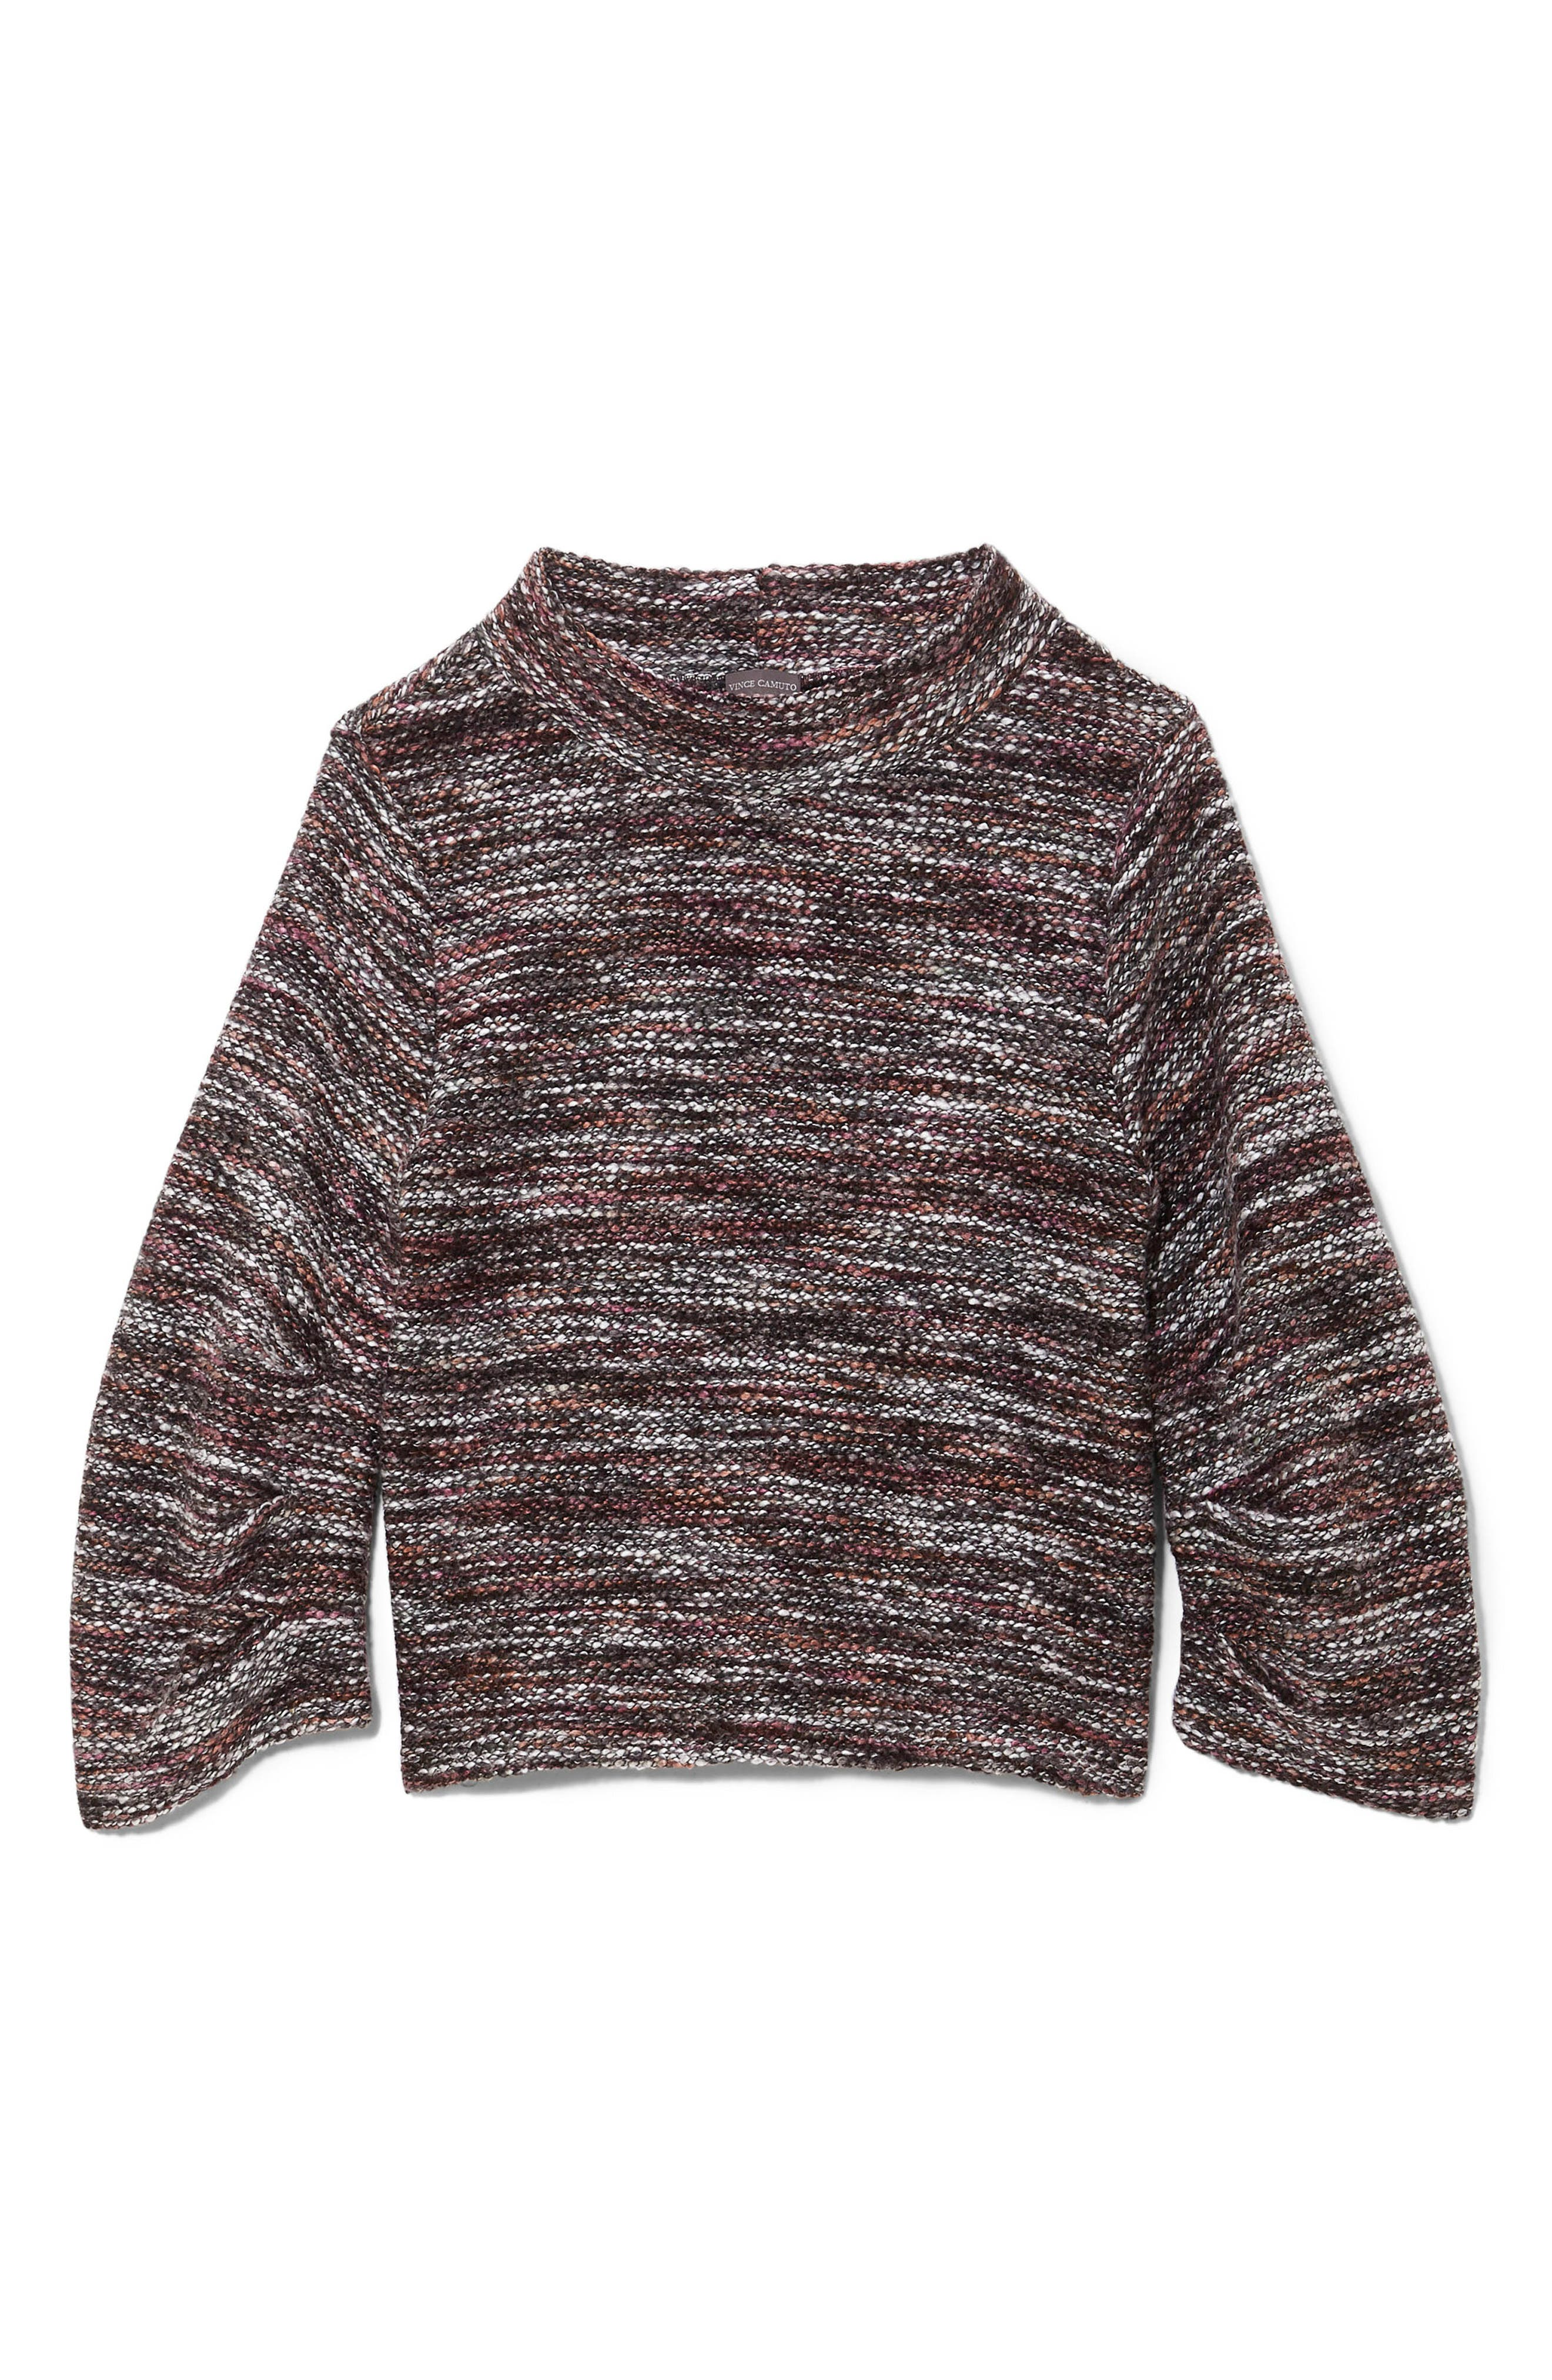 Gathered Sleeve Marled Sweater,                             Alternate thumbnail 3, color,                             601